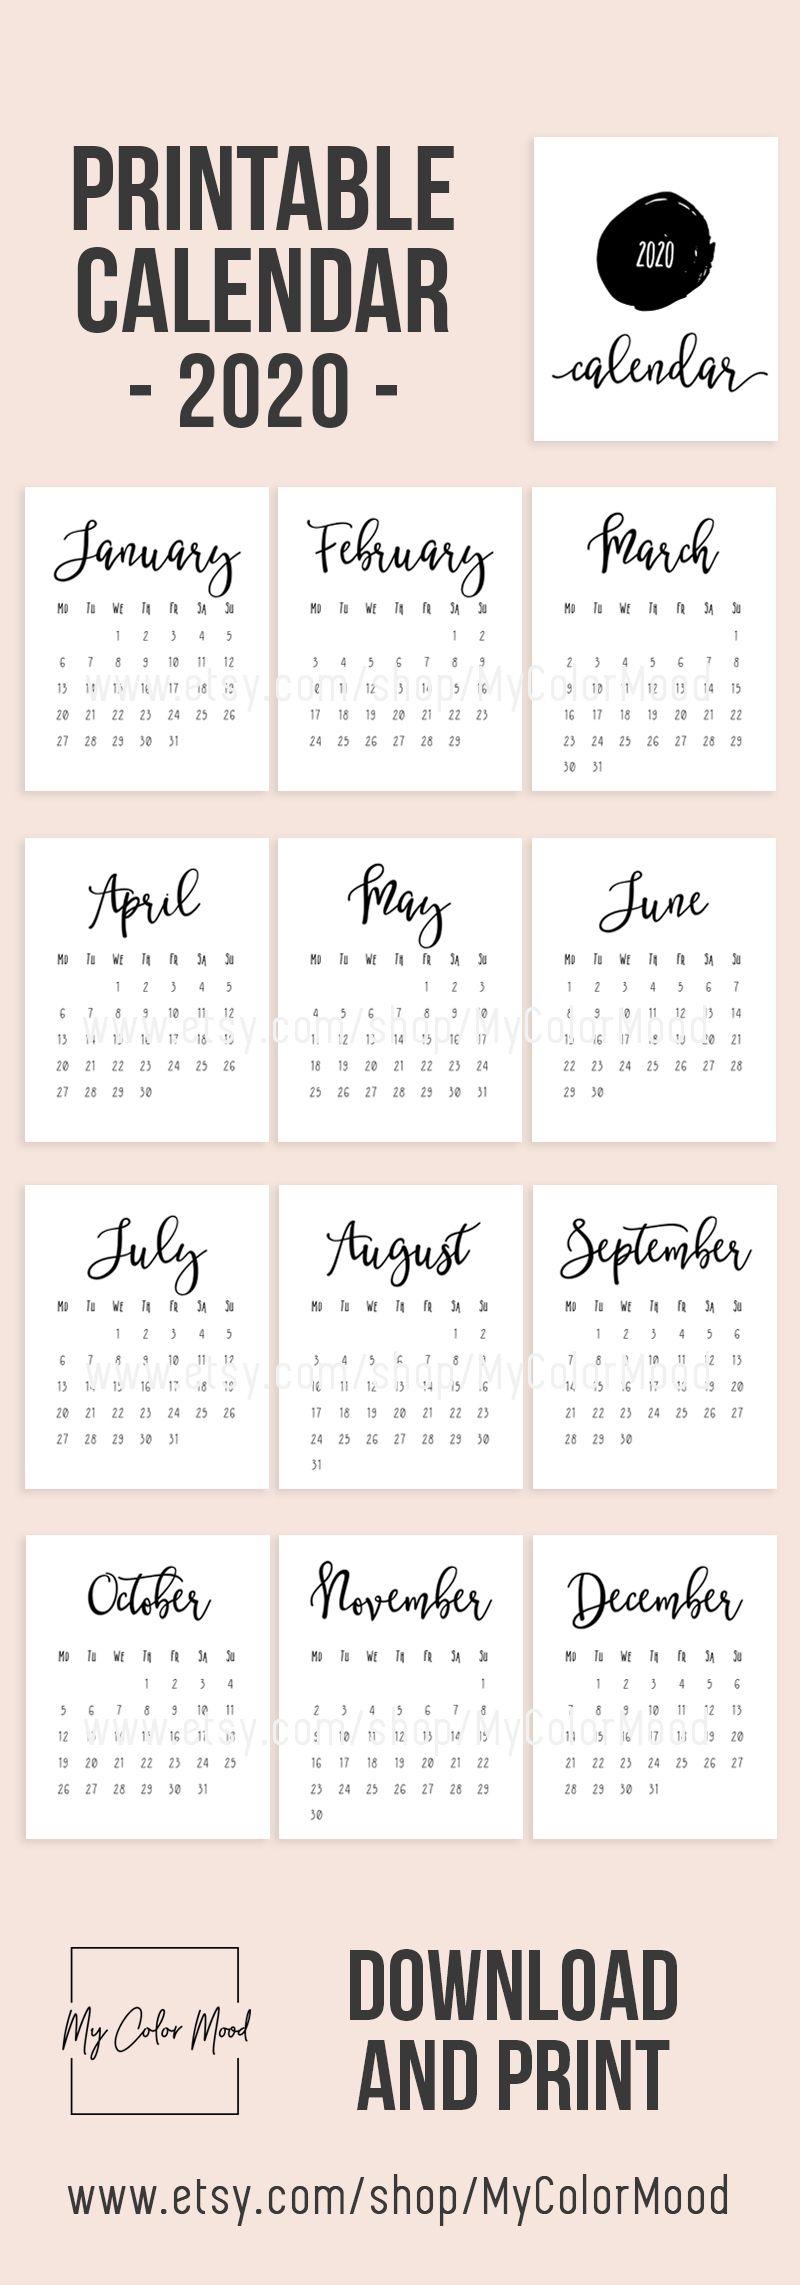 2020 Calendar Printable Monthly Calendar 2020 Wall Calendar Pages Modern Minimalist Typography Calendar Office Calendar Planner Download In 2020 Calendar Pages Monthly Calendar Printable Calendar Printables